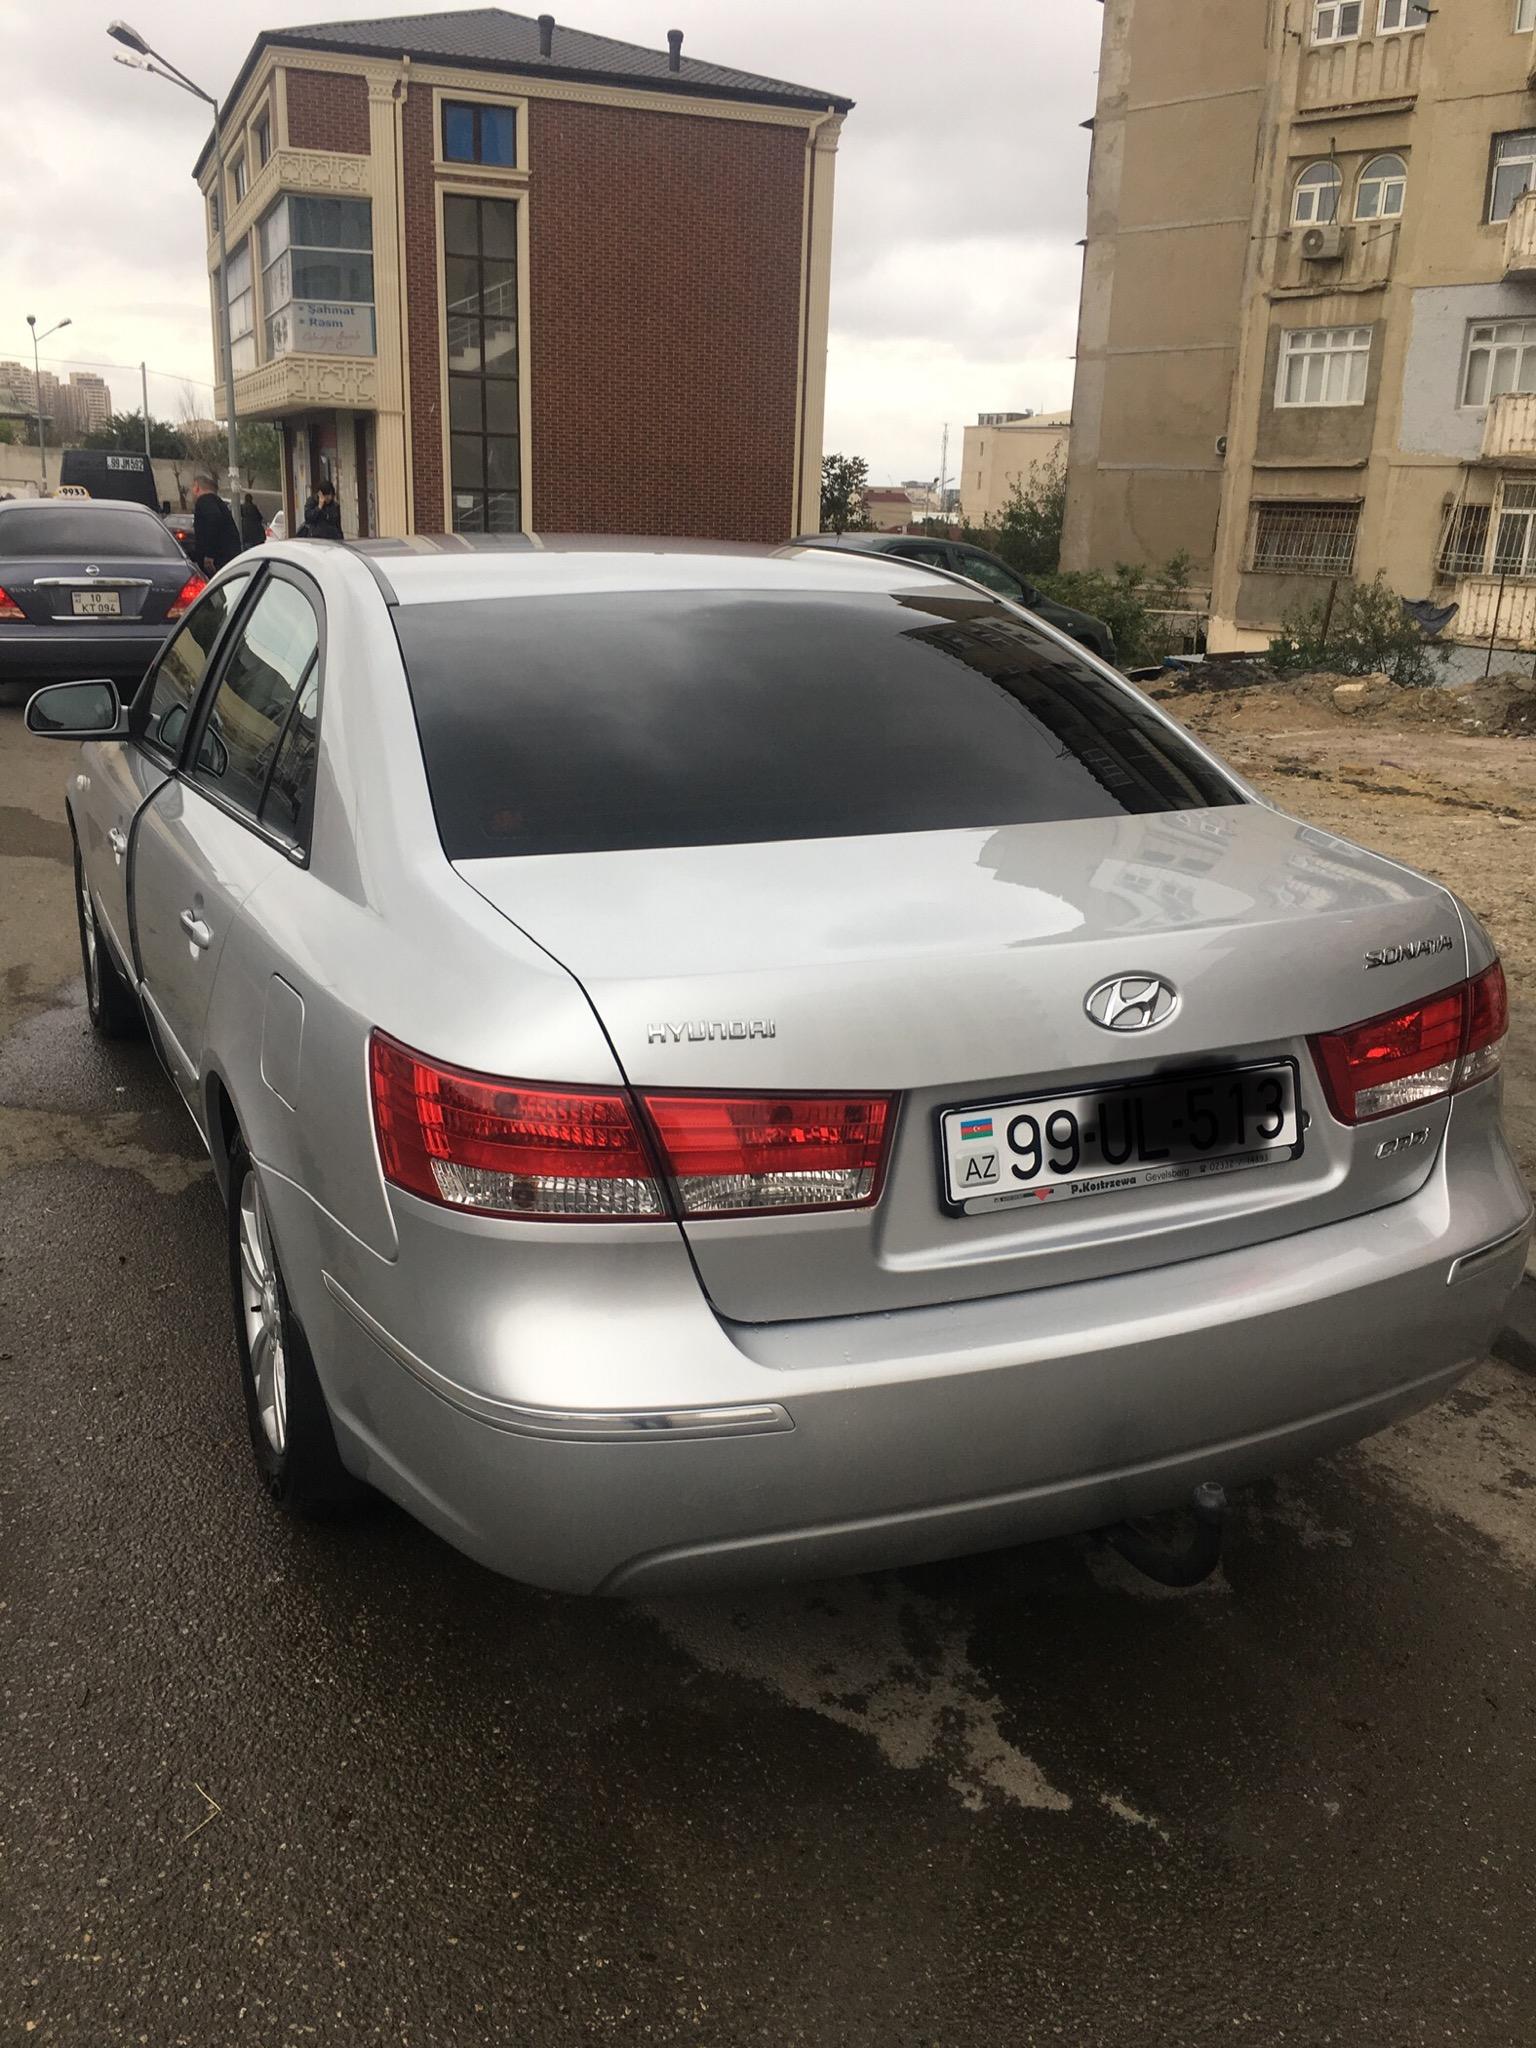 Hyundai Sonata 2.0(lt) 2008 Second hand  $10400